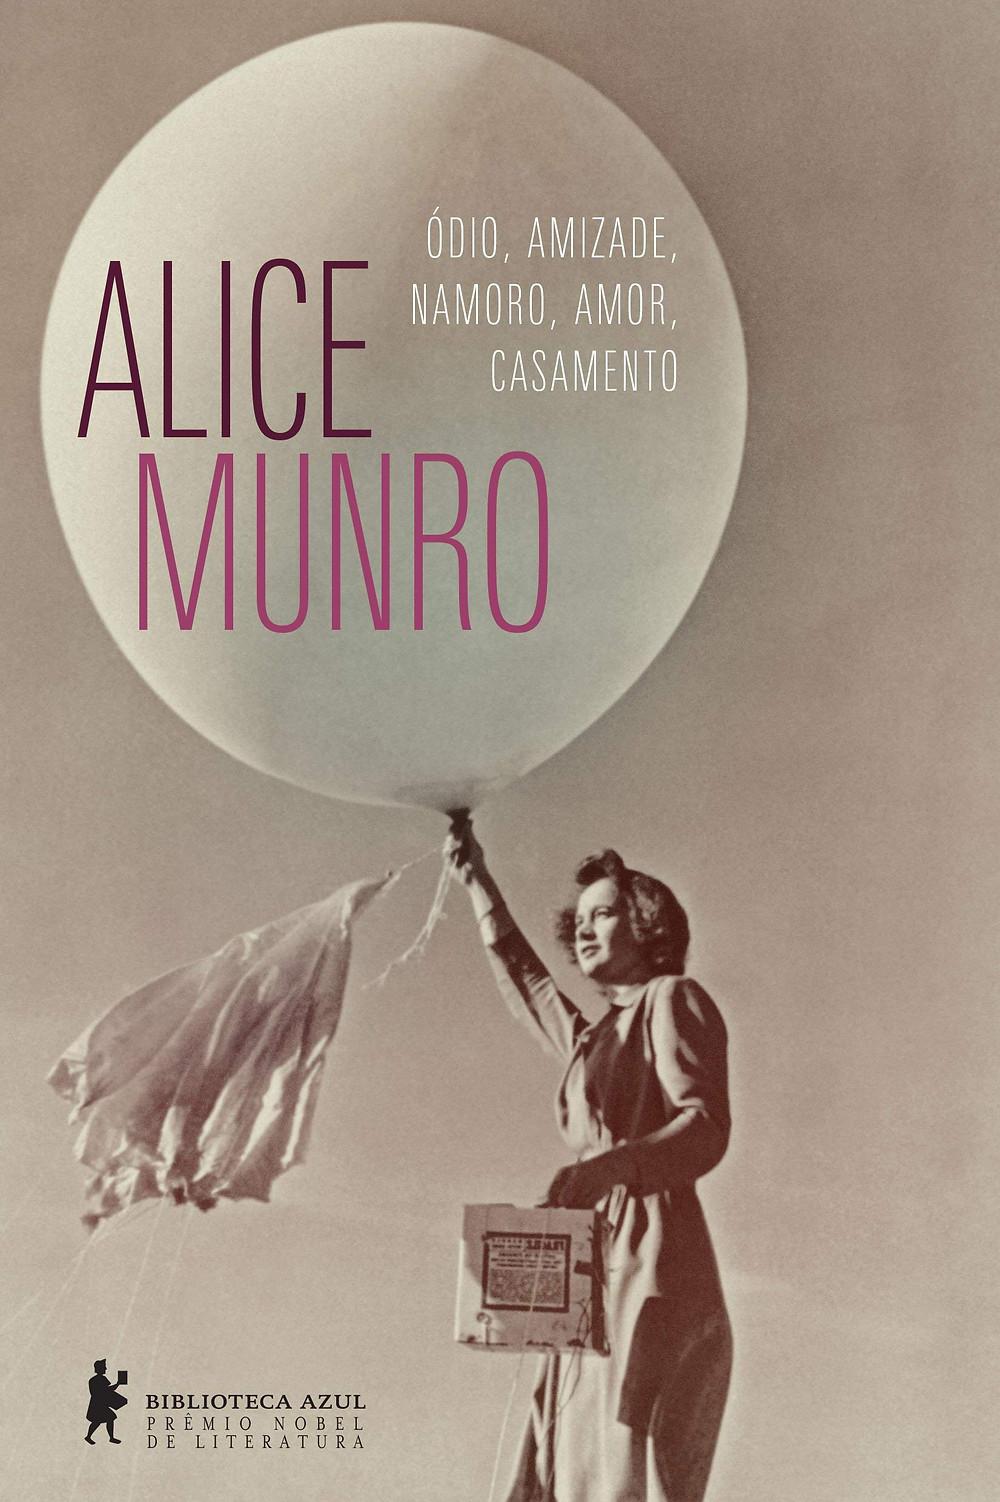 capa do livro de Alice Munro